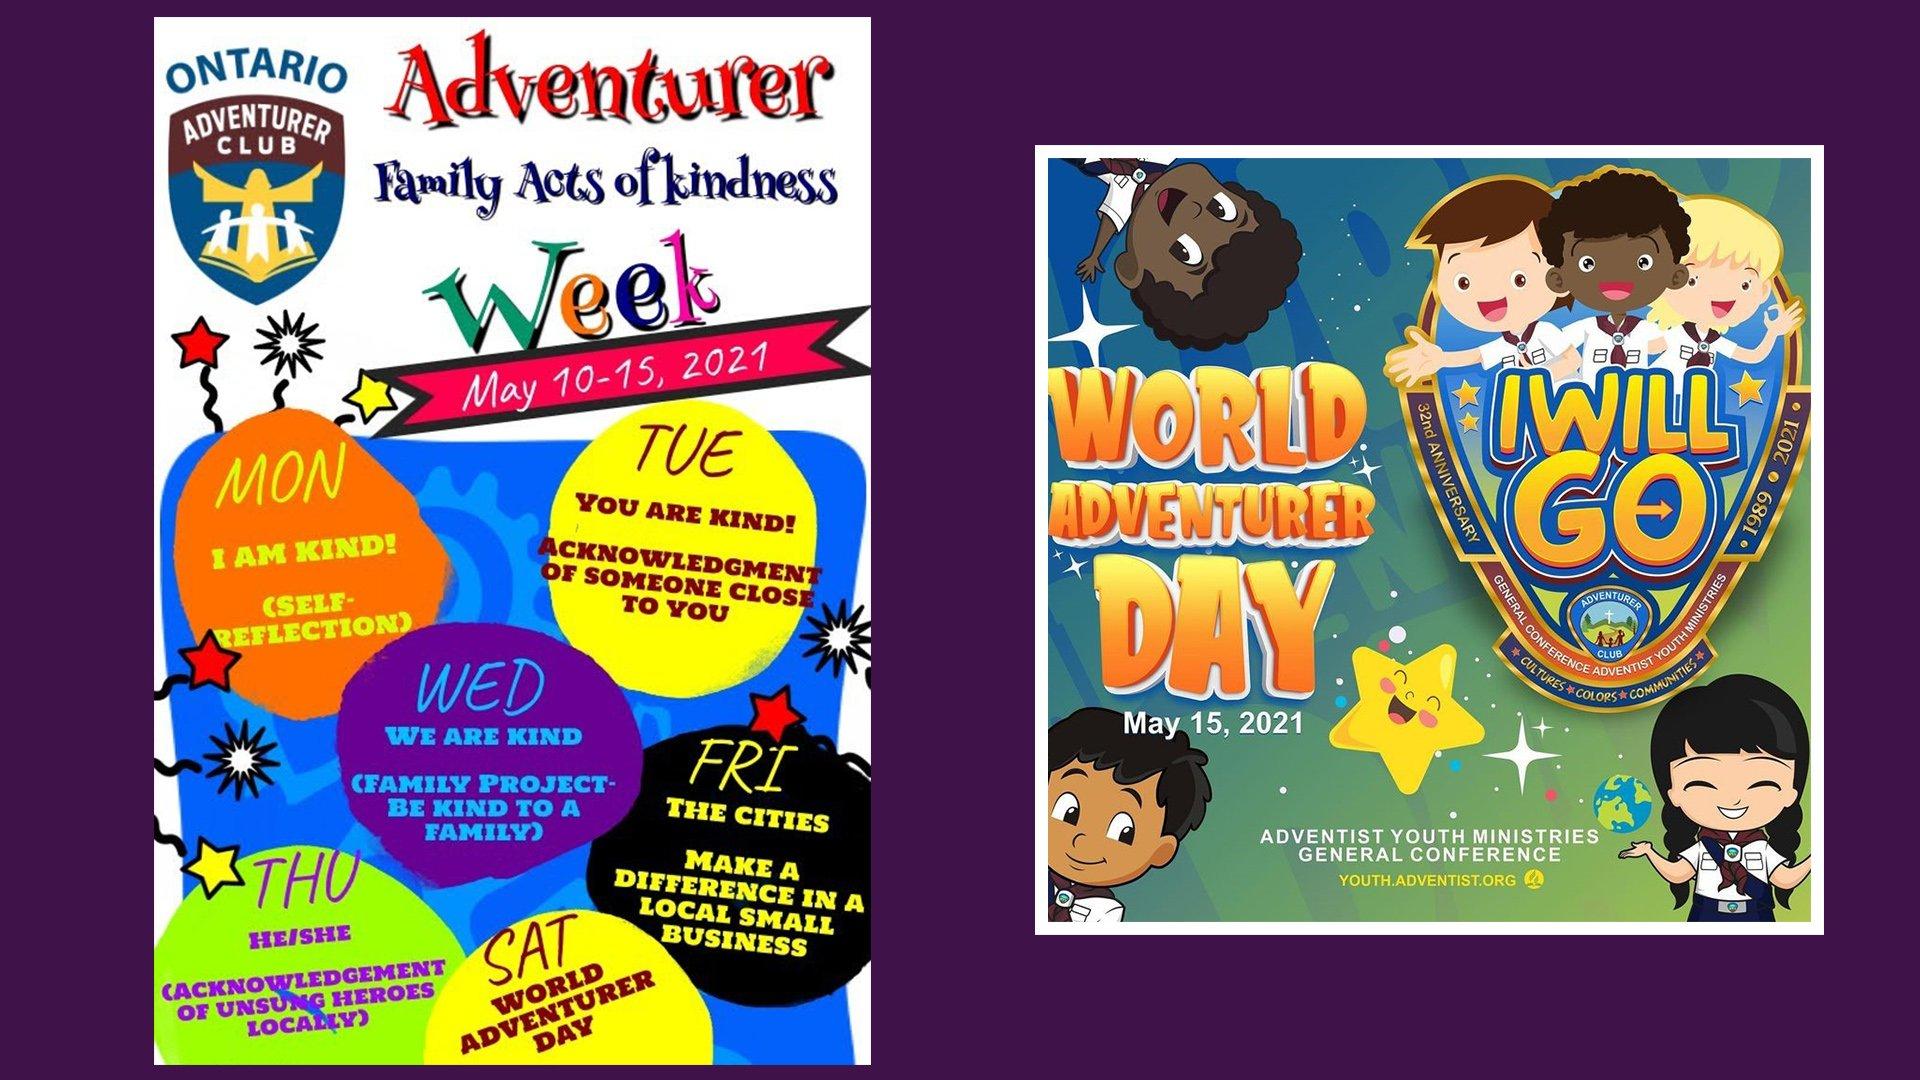 Adventurers ad